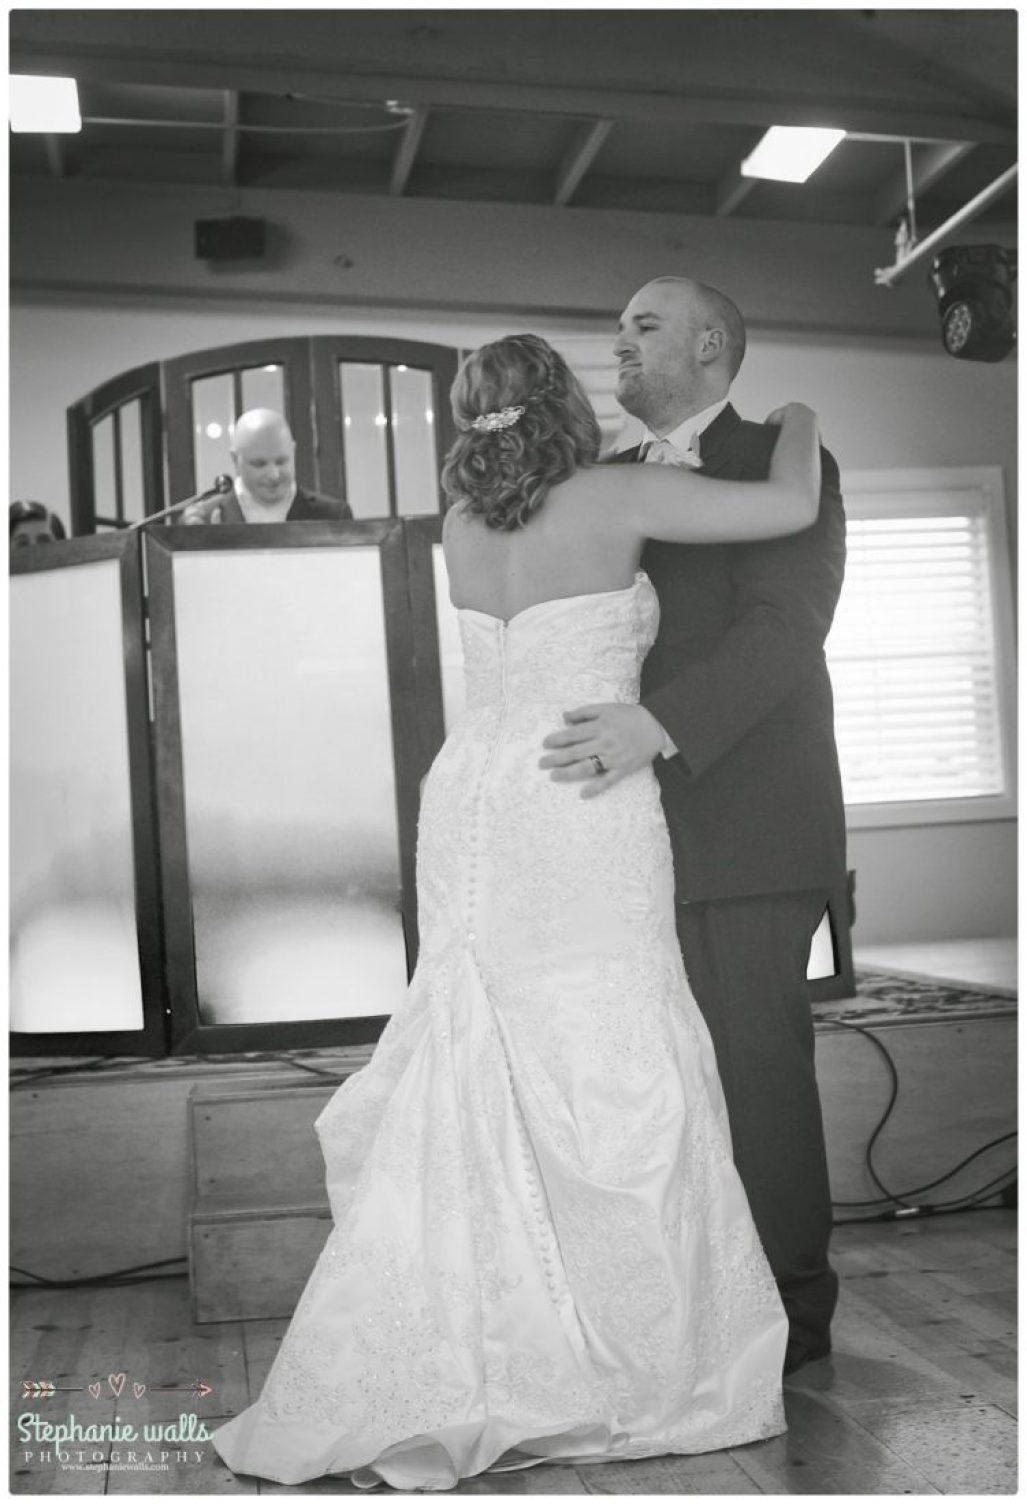 2016 03 24 0029 Racing Love   Snohomish Event Center   Snohomish Wedding Photographer